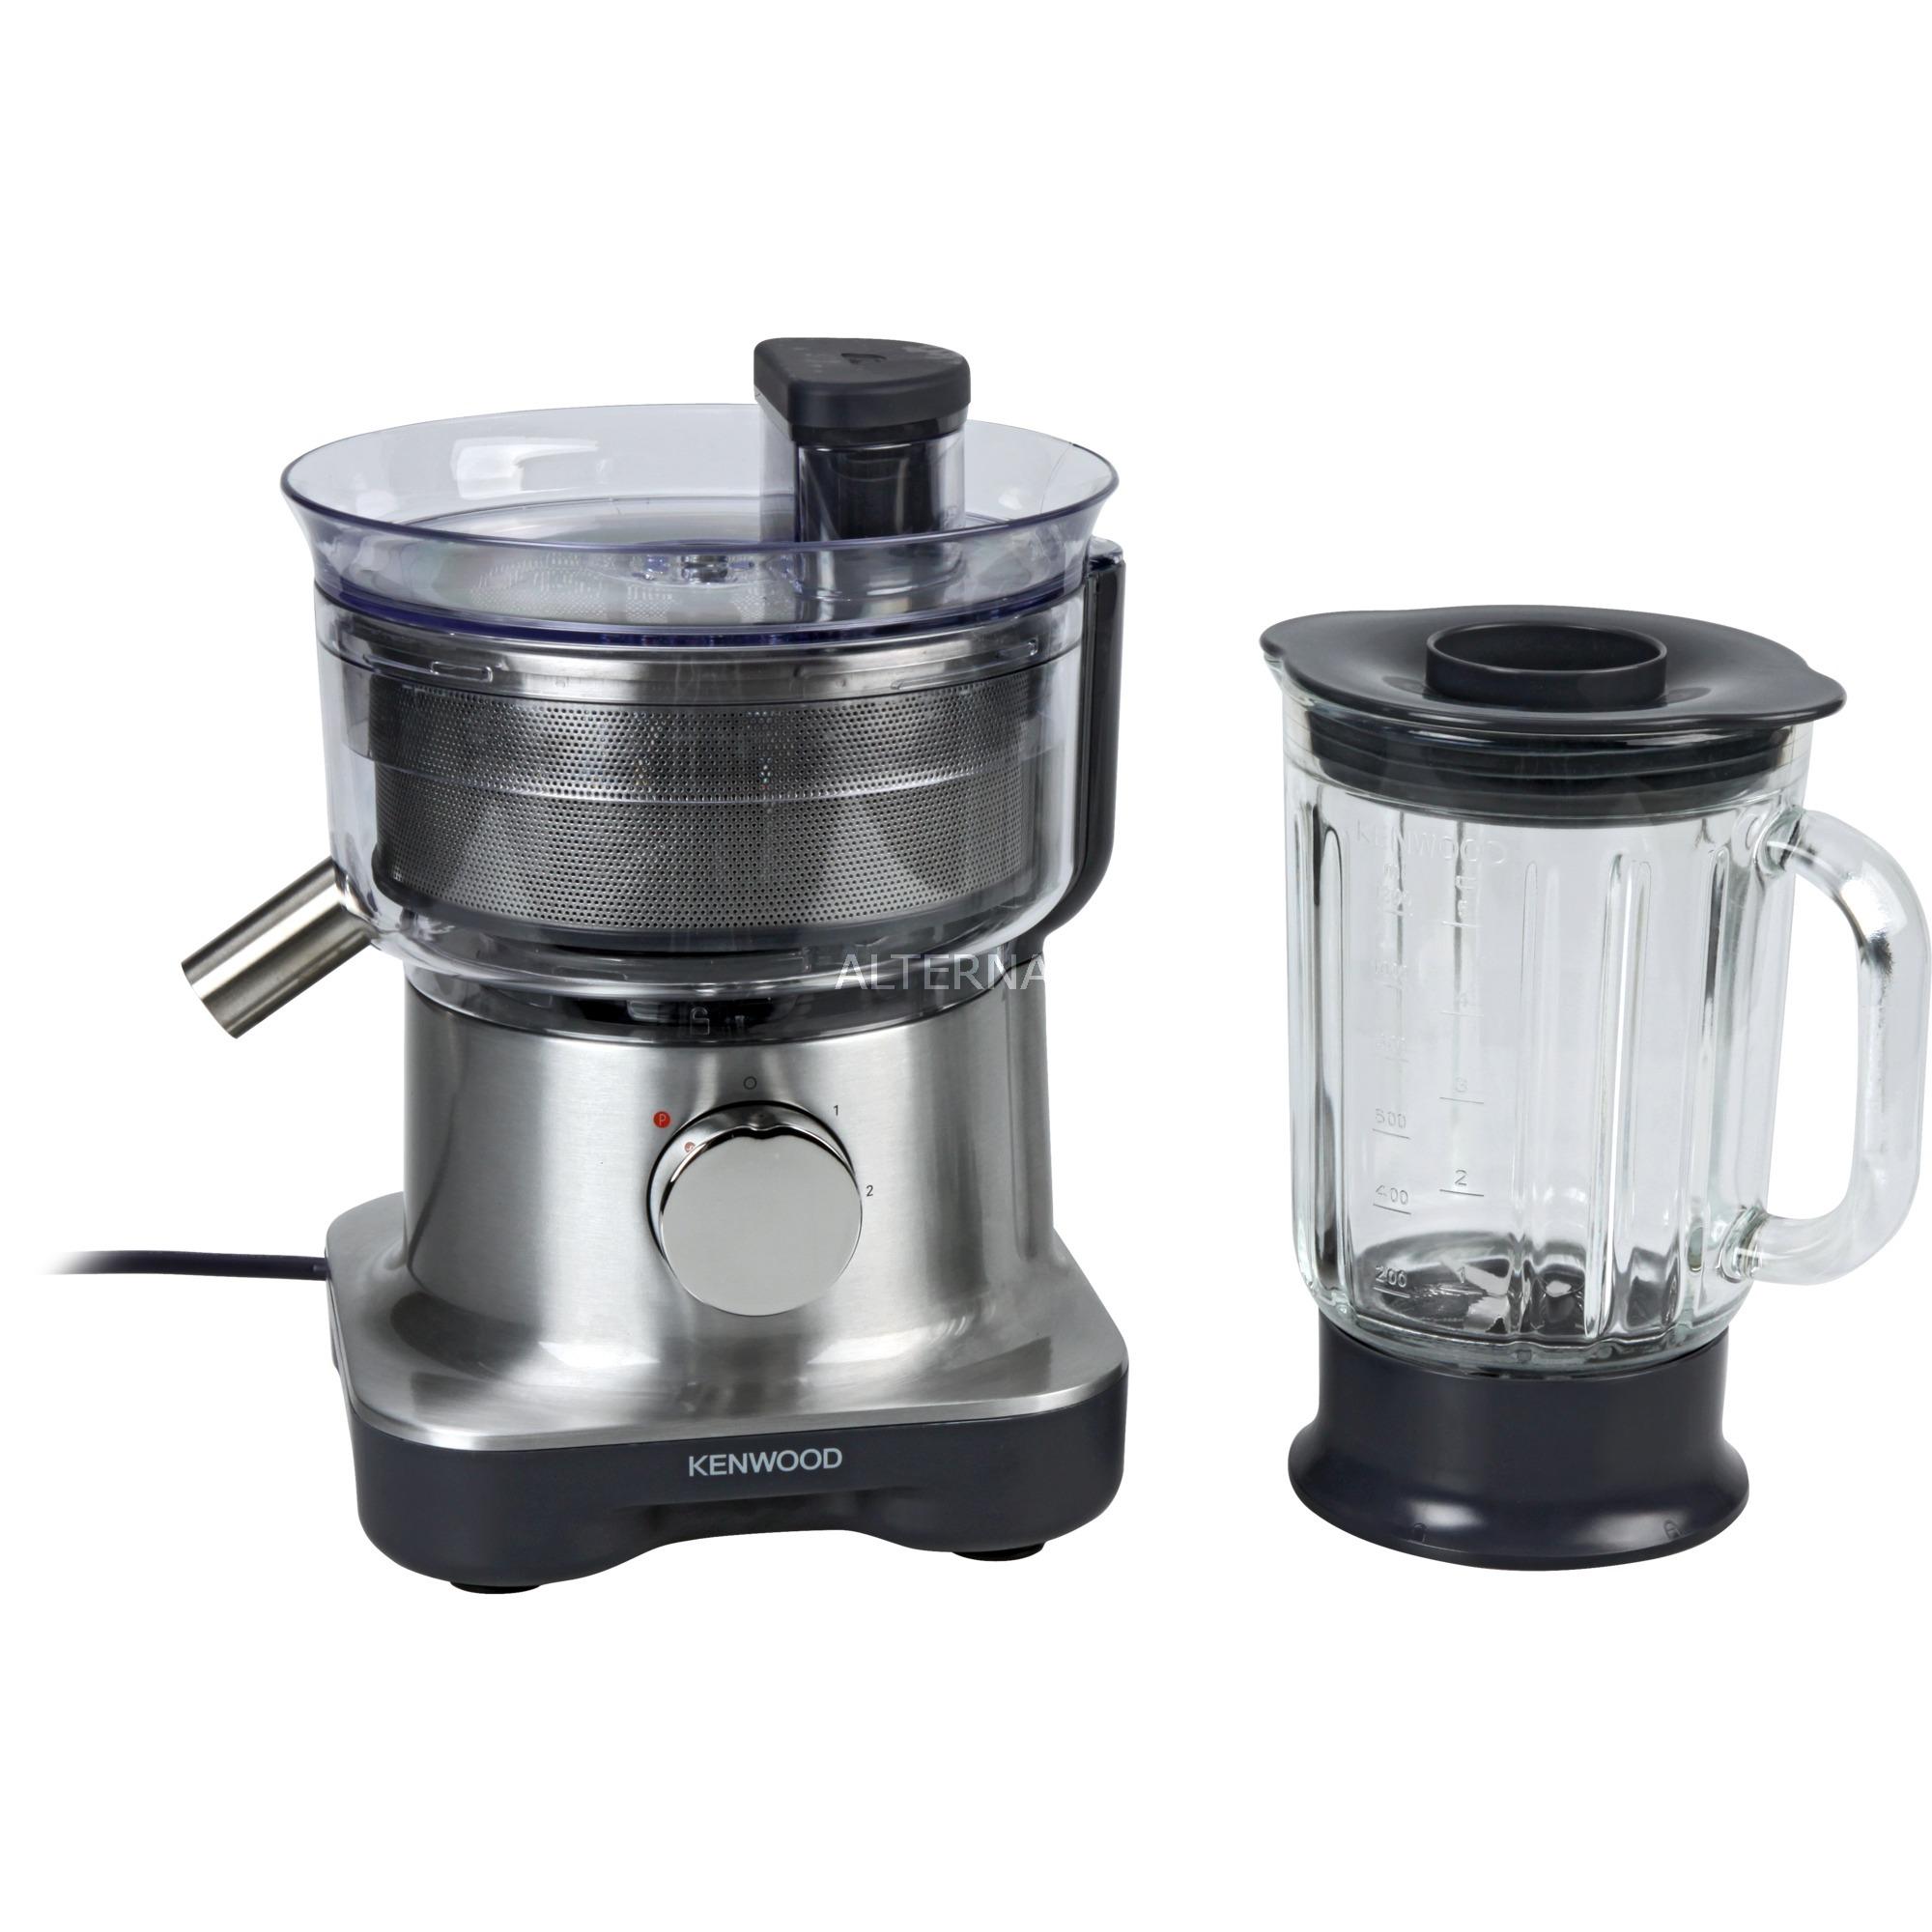 FPM270 750W 2.1L Negro, Transparente robot de cocina